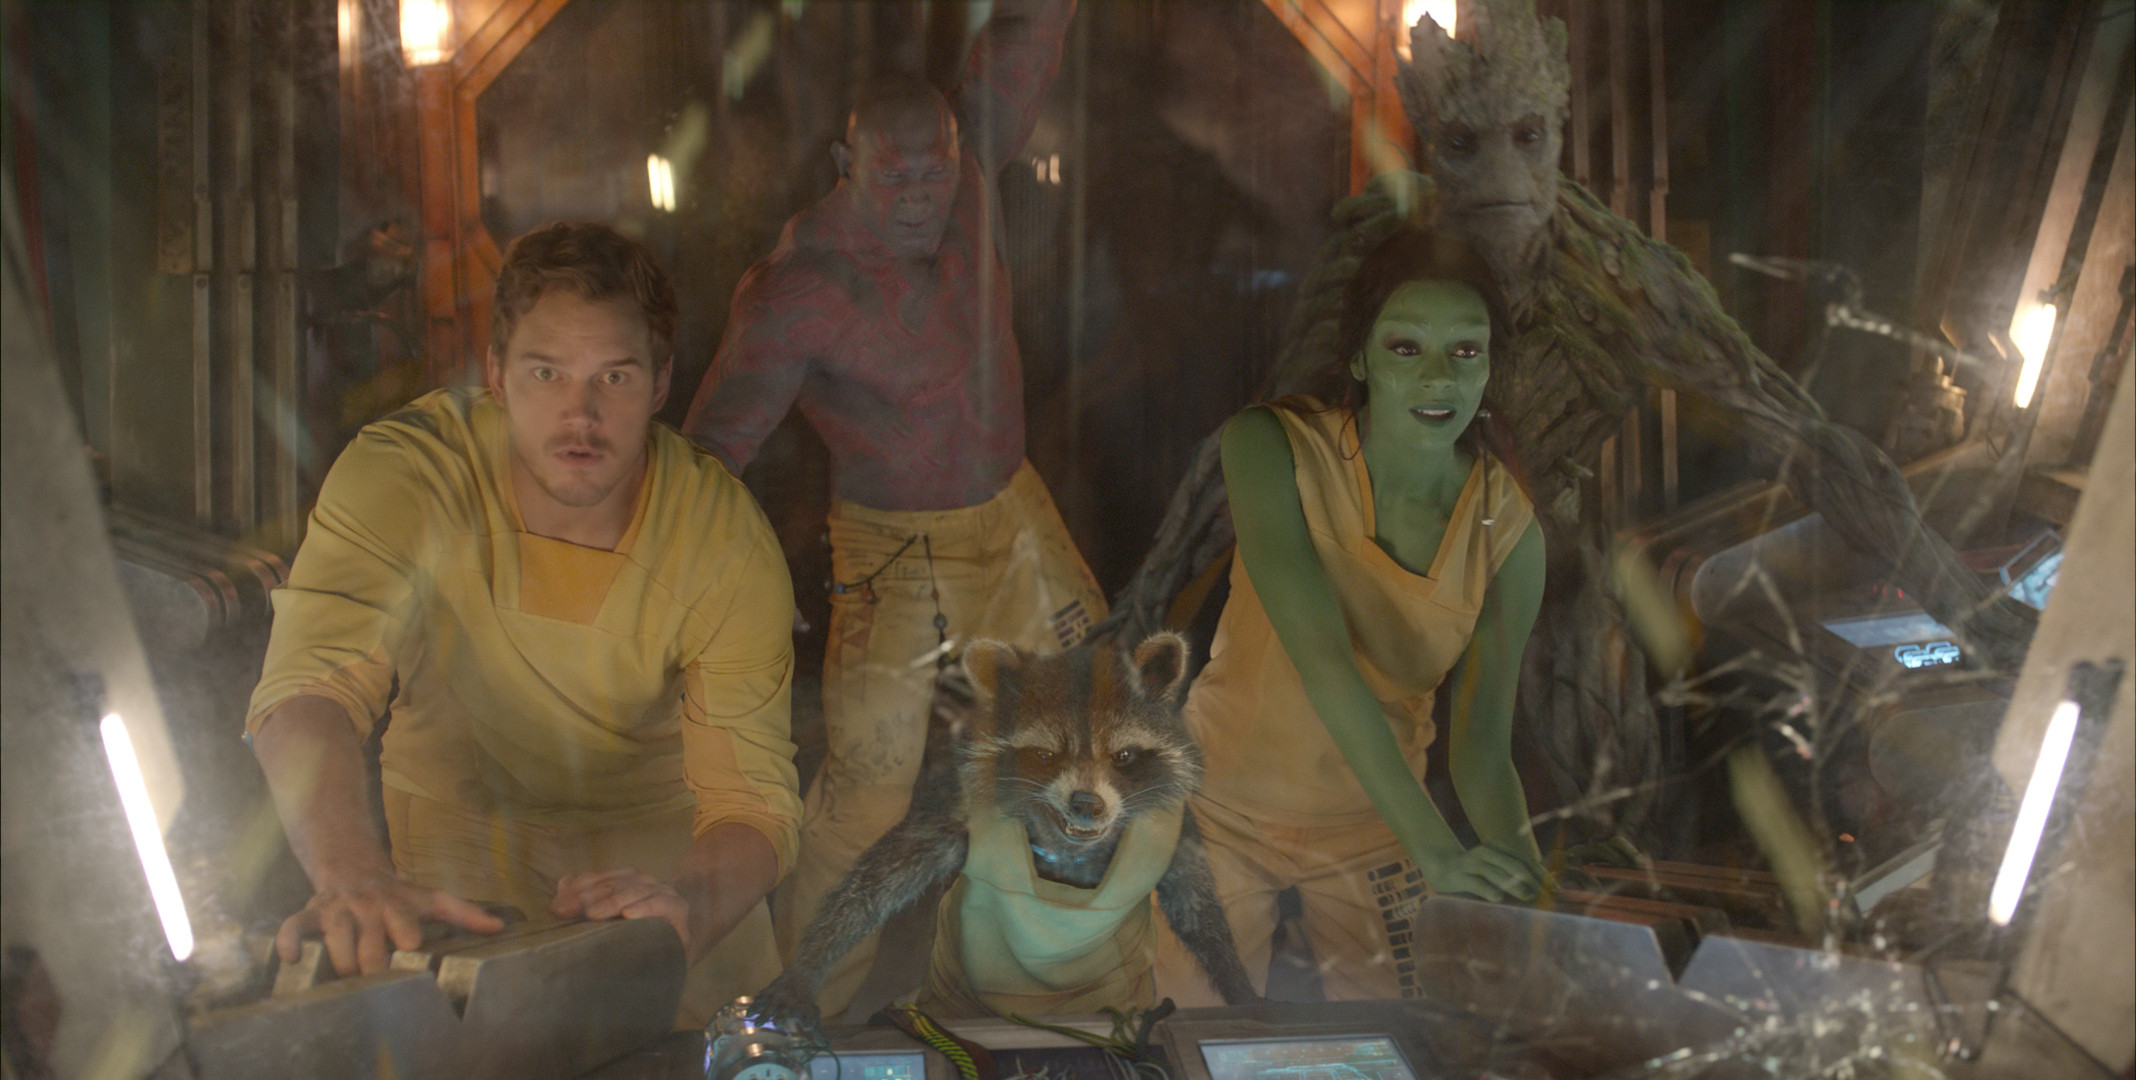 guardians-of-the-galaxy_stills-62.jpg